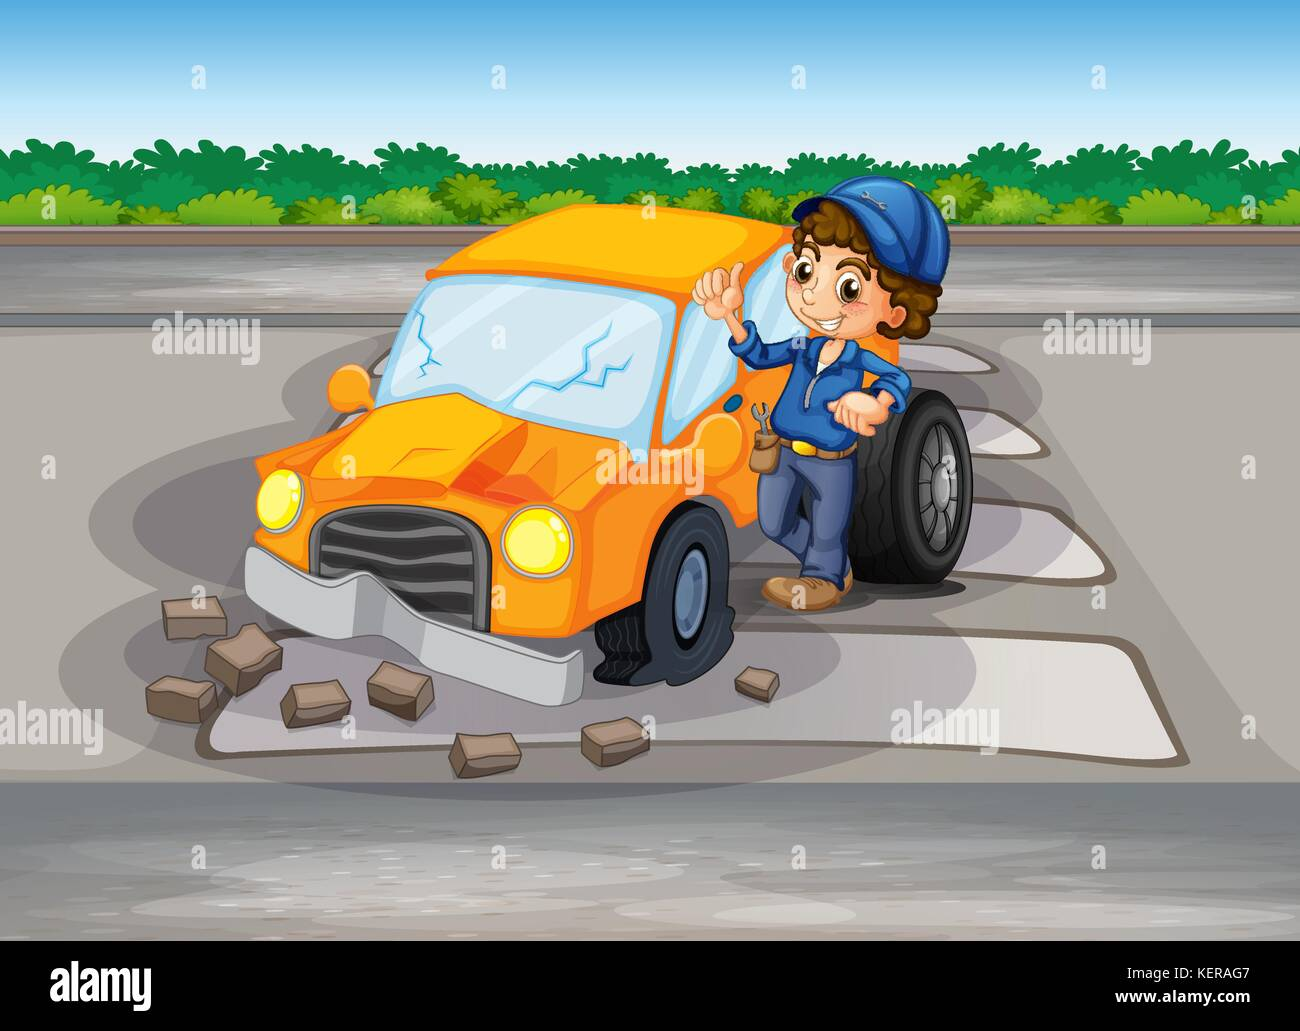 Accident Car Bushes Stockfotos & Accident Car Bushes Bilder - Alamy